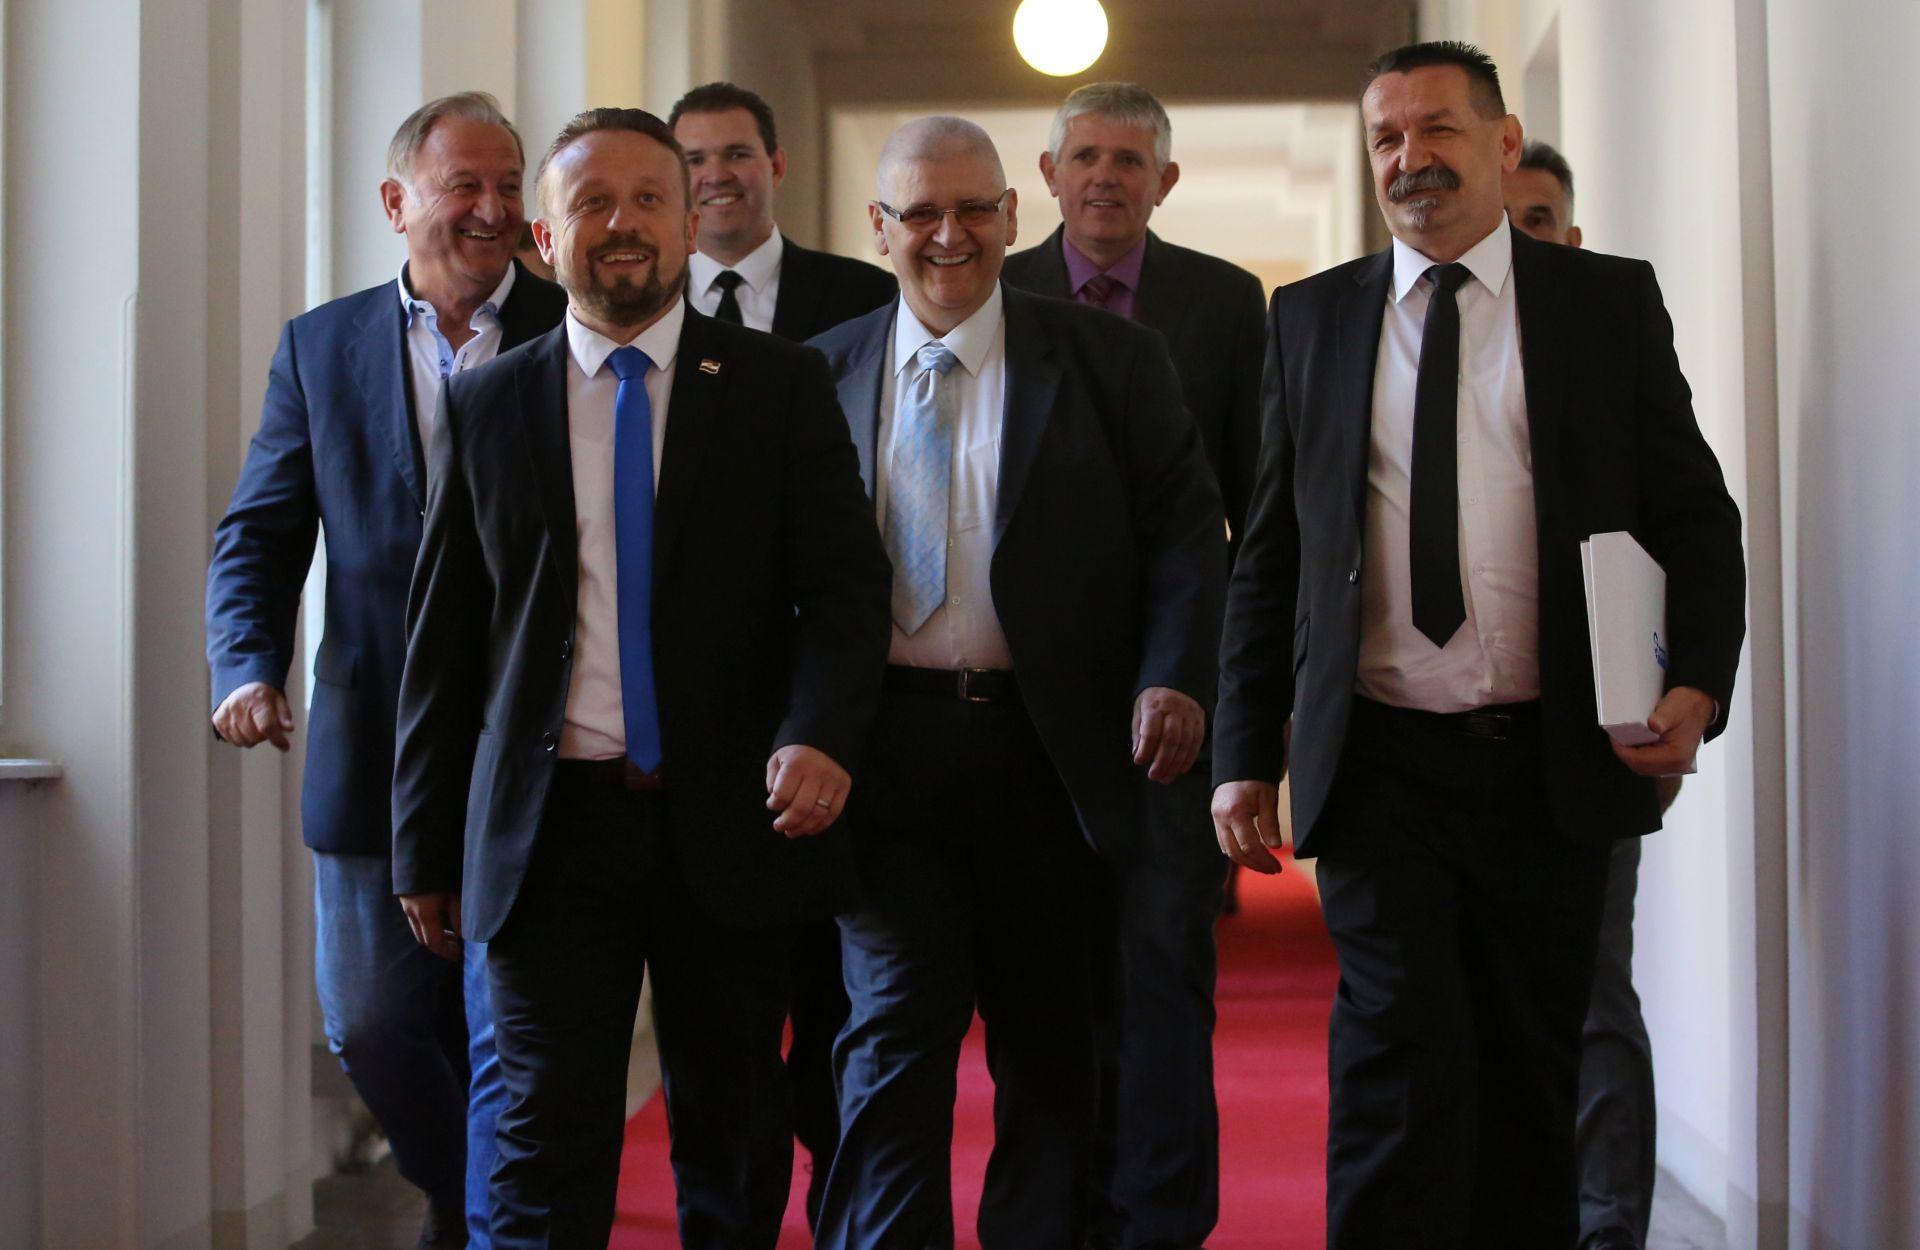 DOMOVINSKA KOALICIJA: U Zadru predstavljen Program reforme pravosuđa